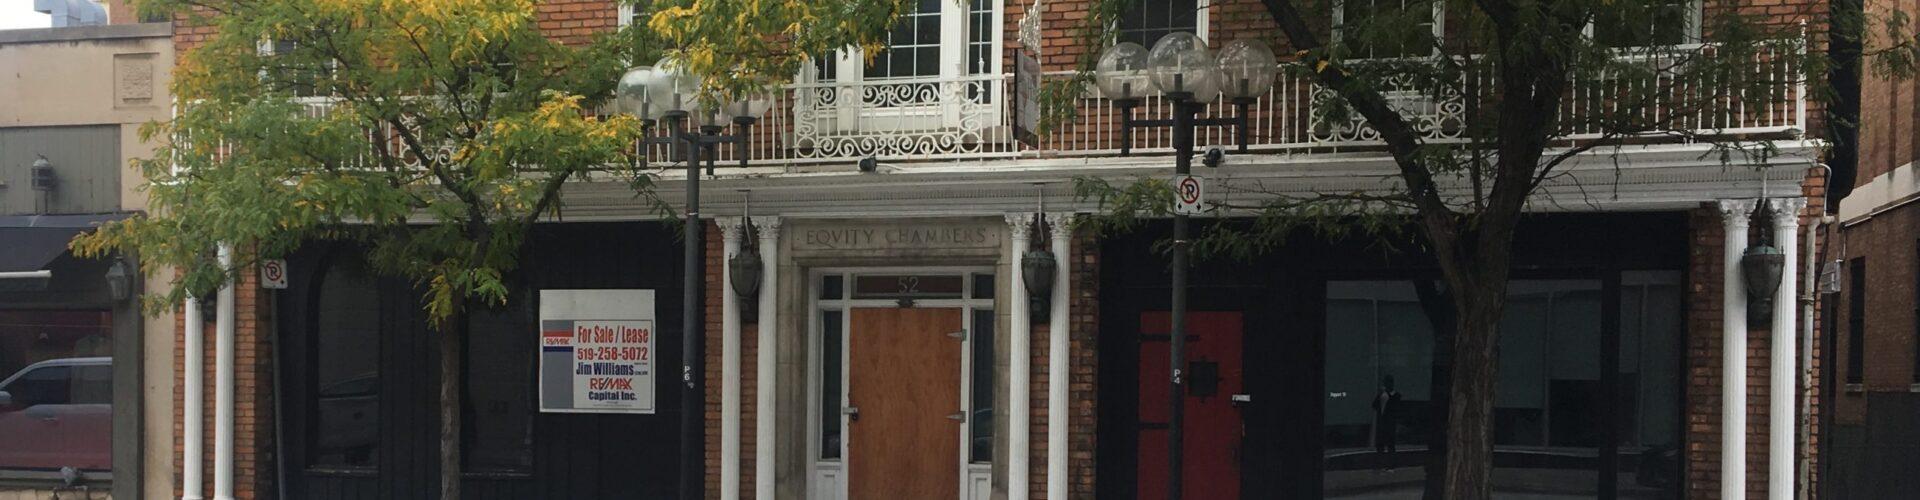 Photo of 46 Chatham St. W.